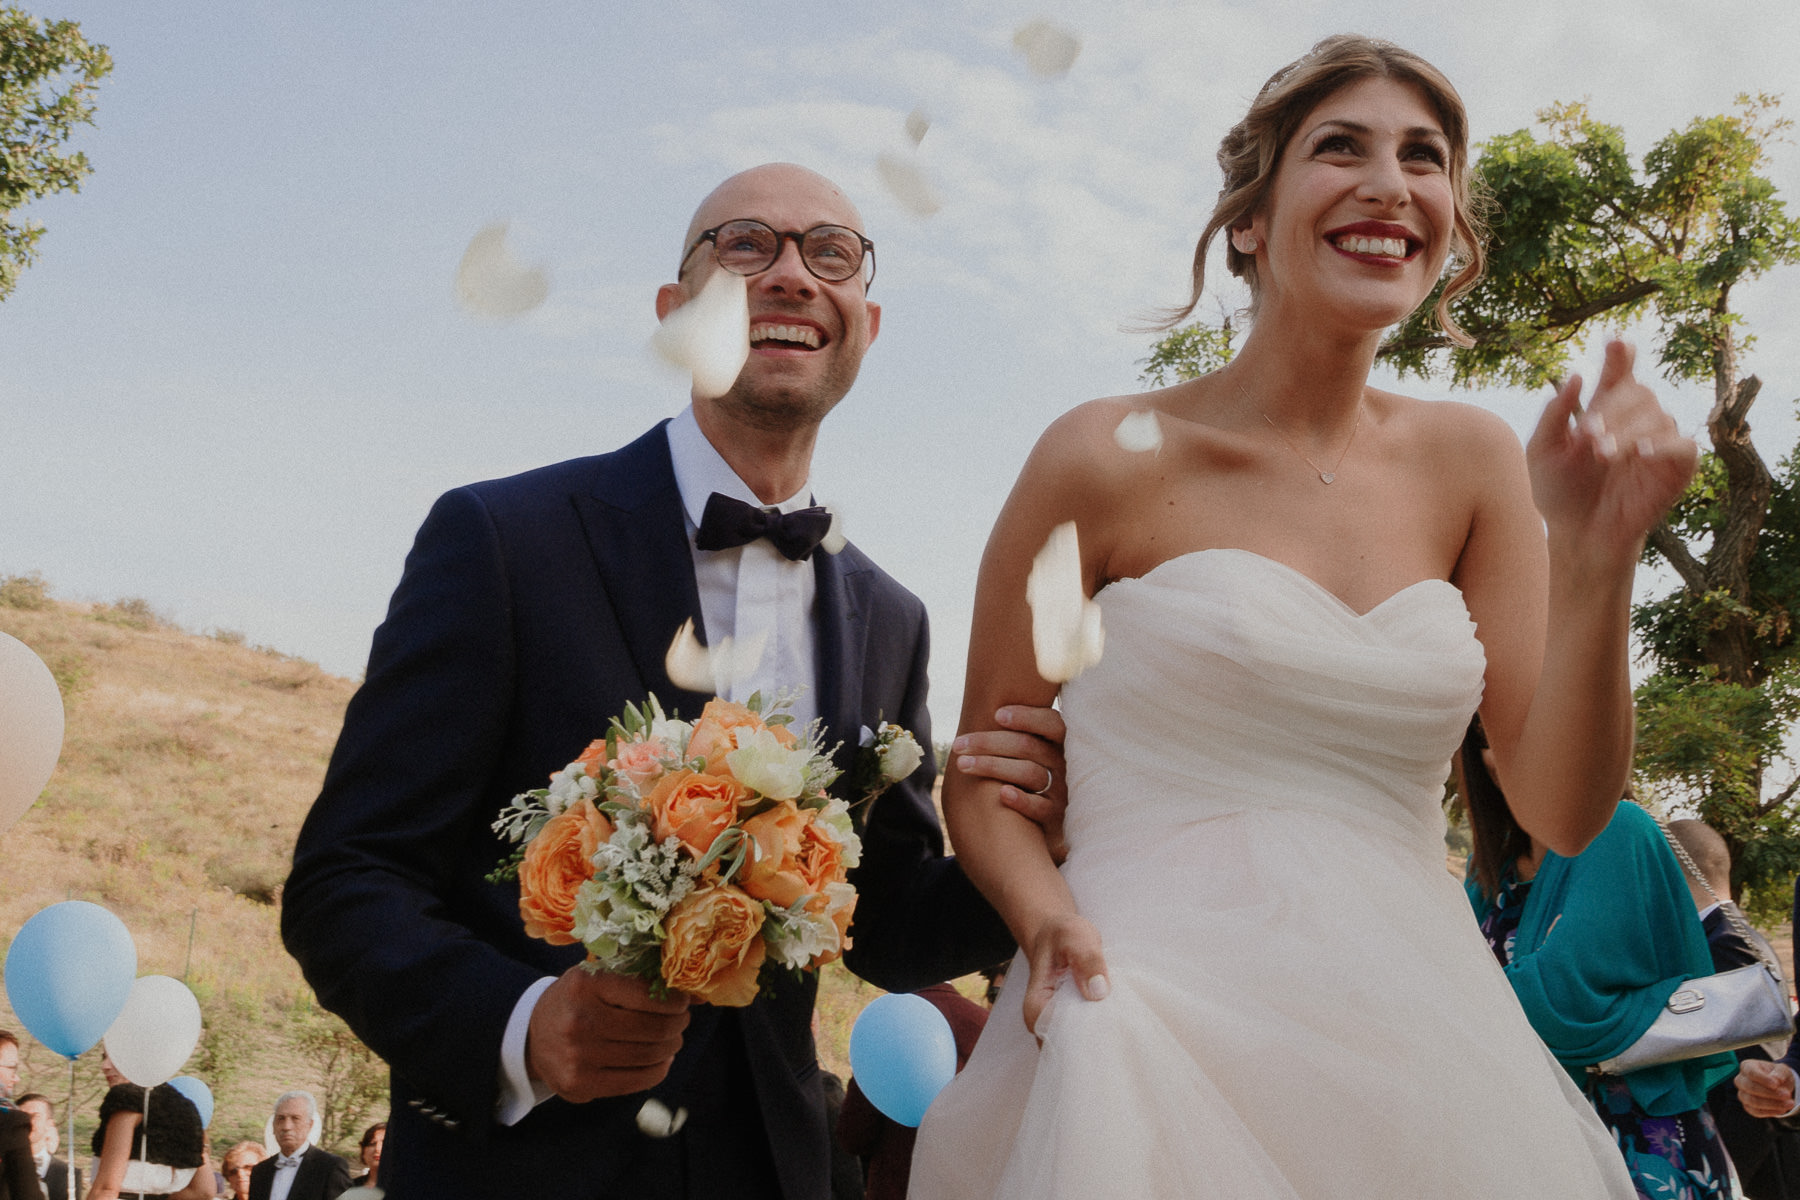 fotografo-matrimonio-monte-gesso-cerimonia-lancio-petali-sguardi-francesco-ferrarini